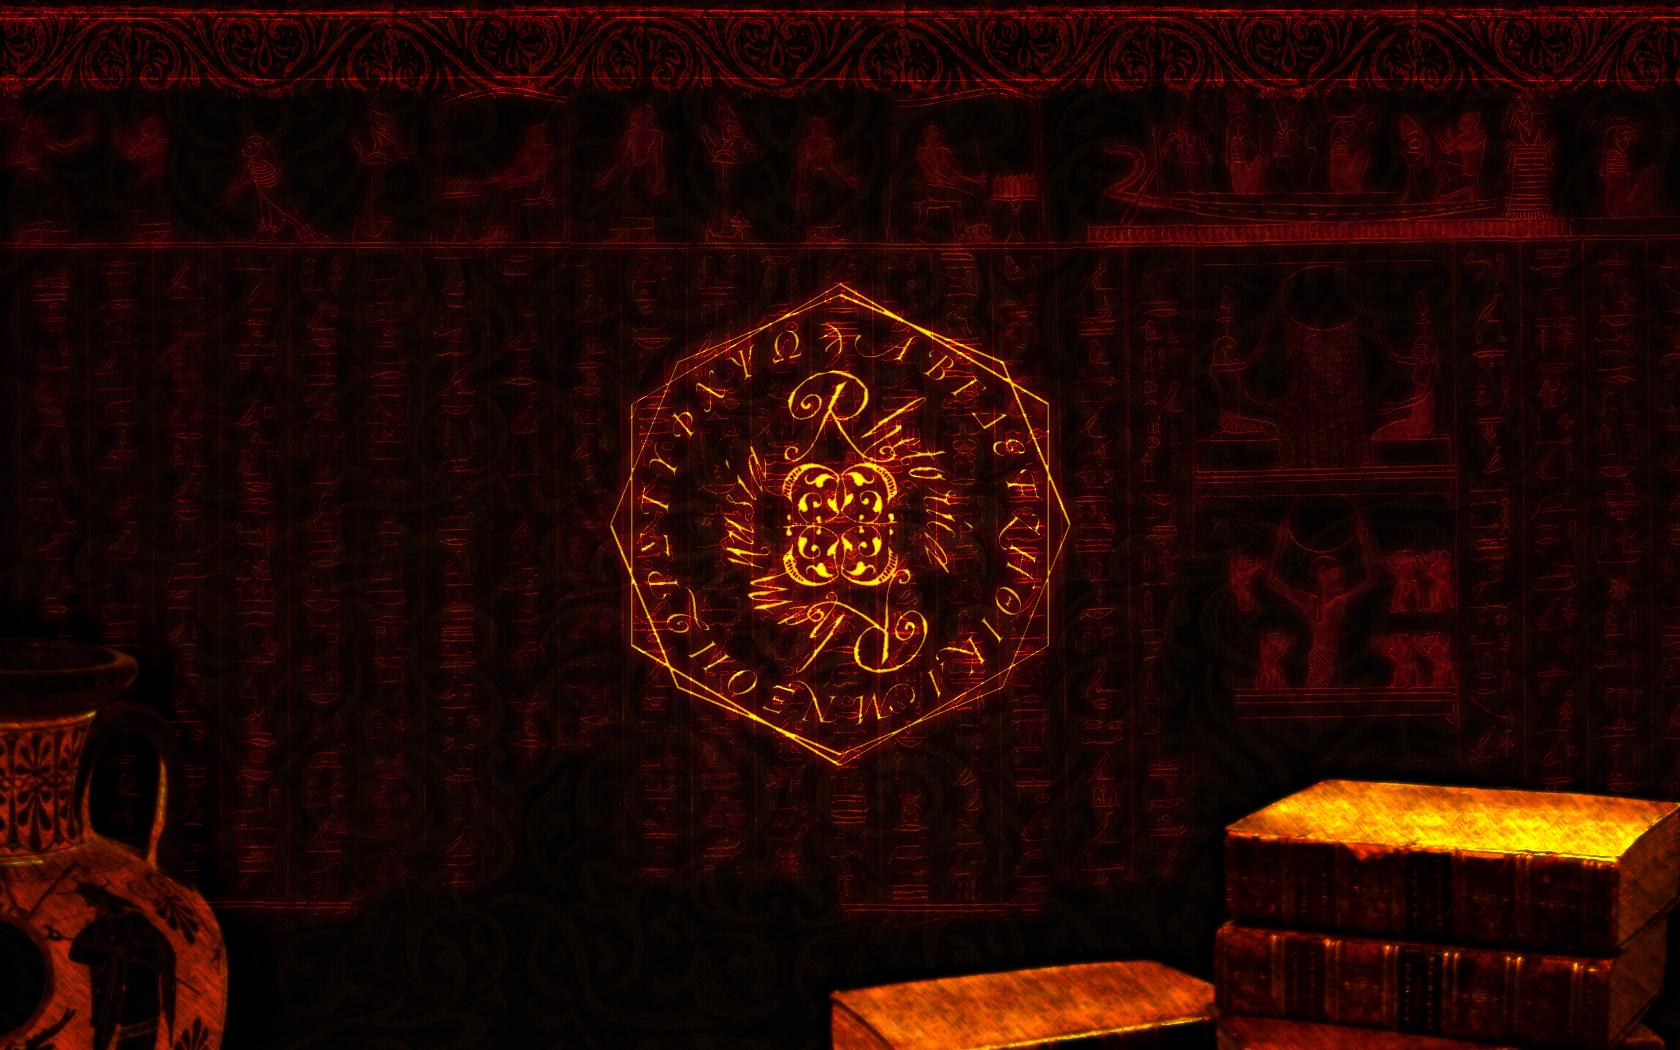 Download Dark Occult Wallpaper 1680x1050 Wallpoper 223571 1680x1050